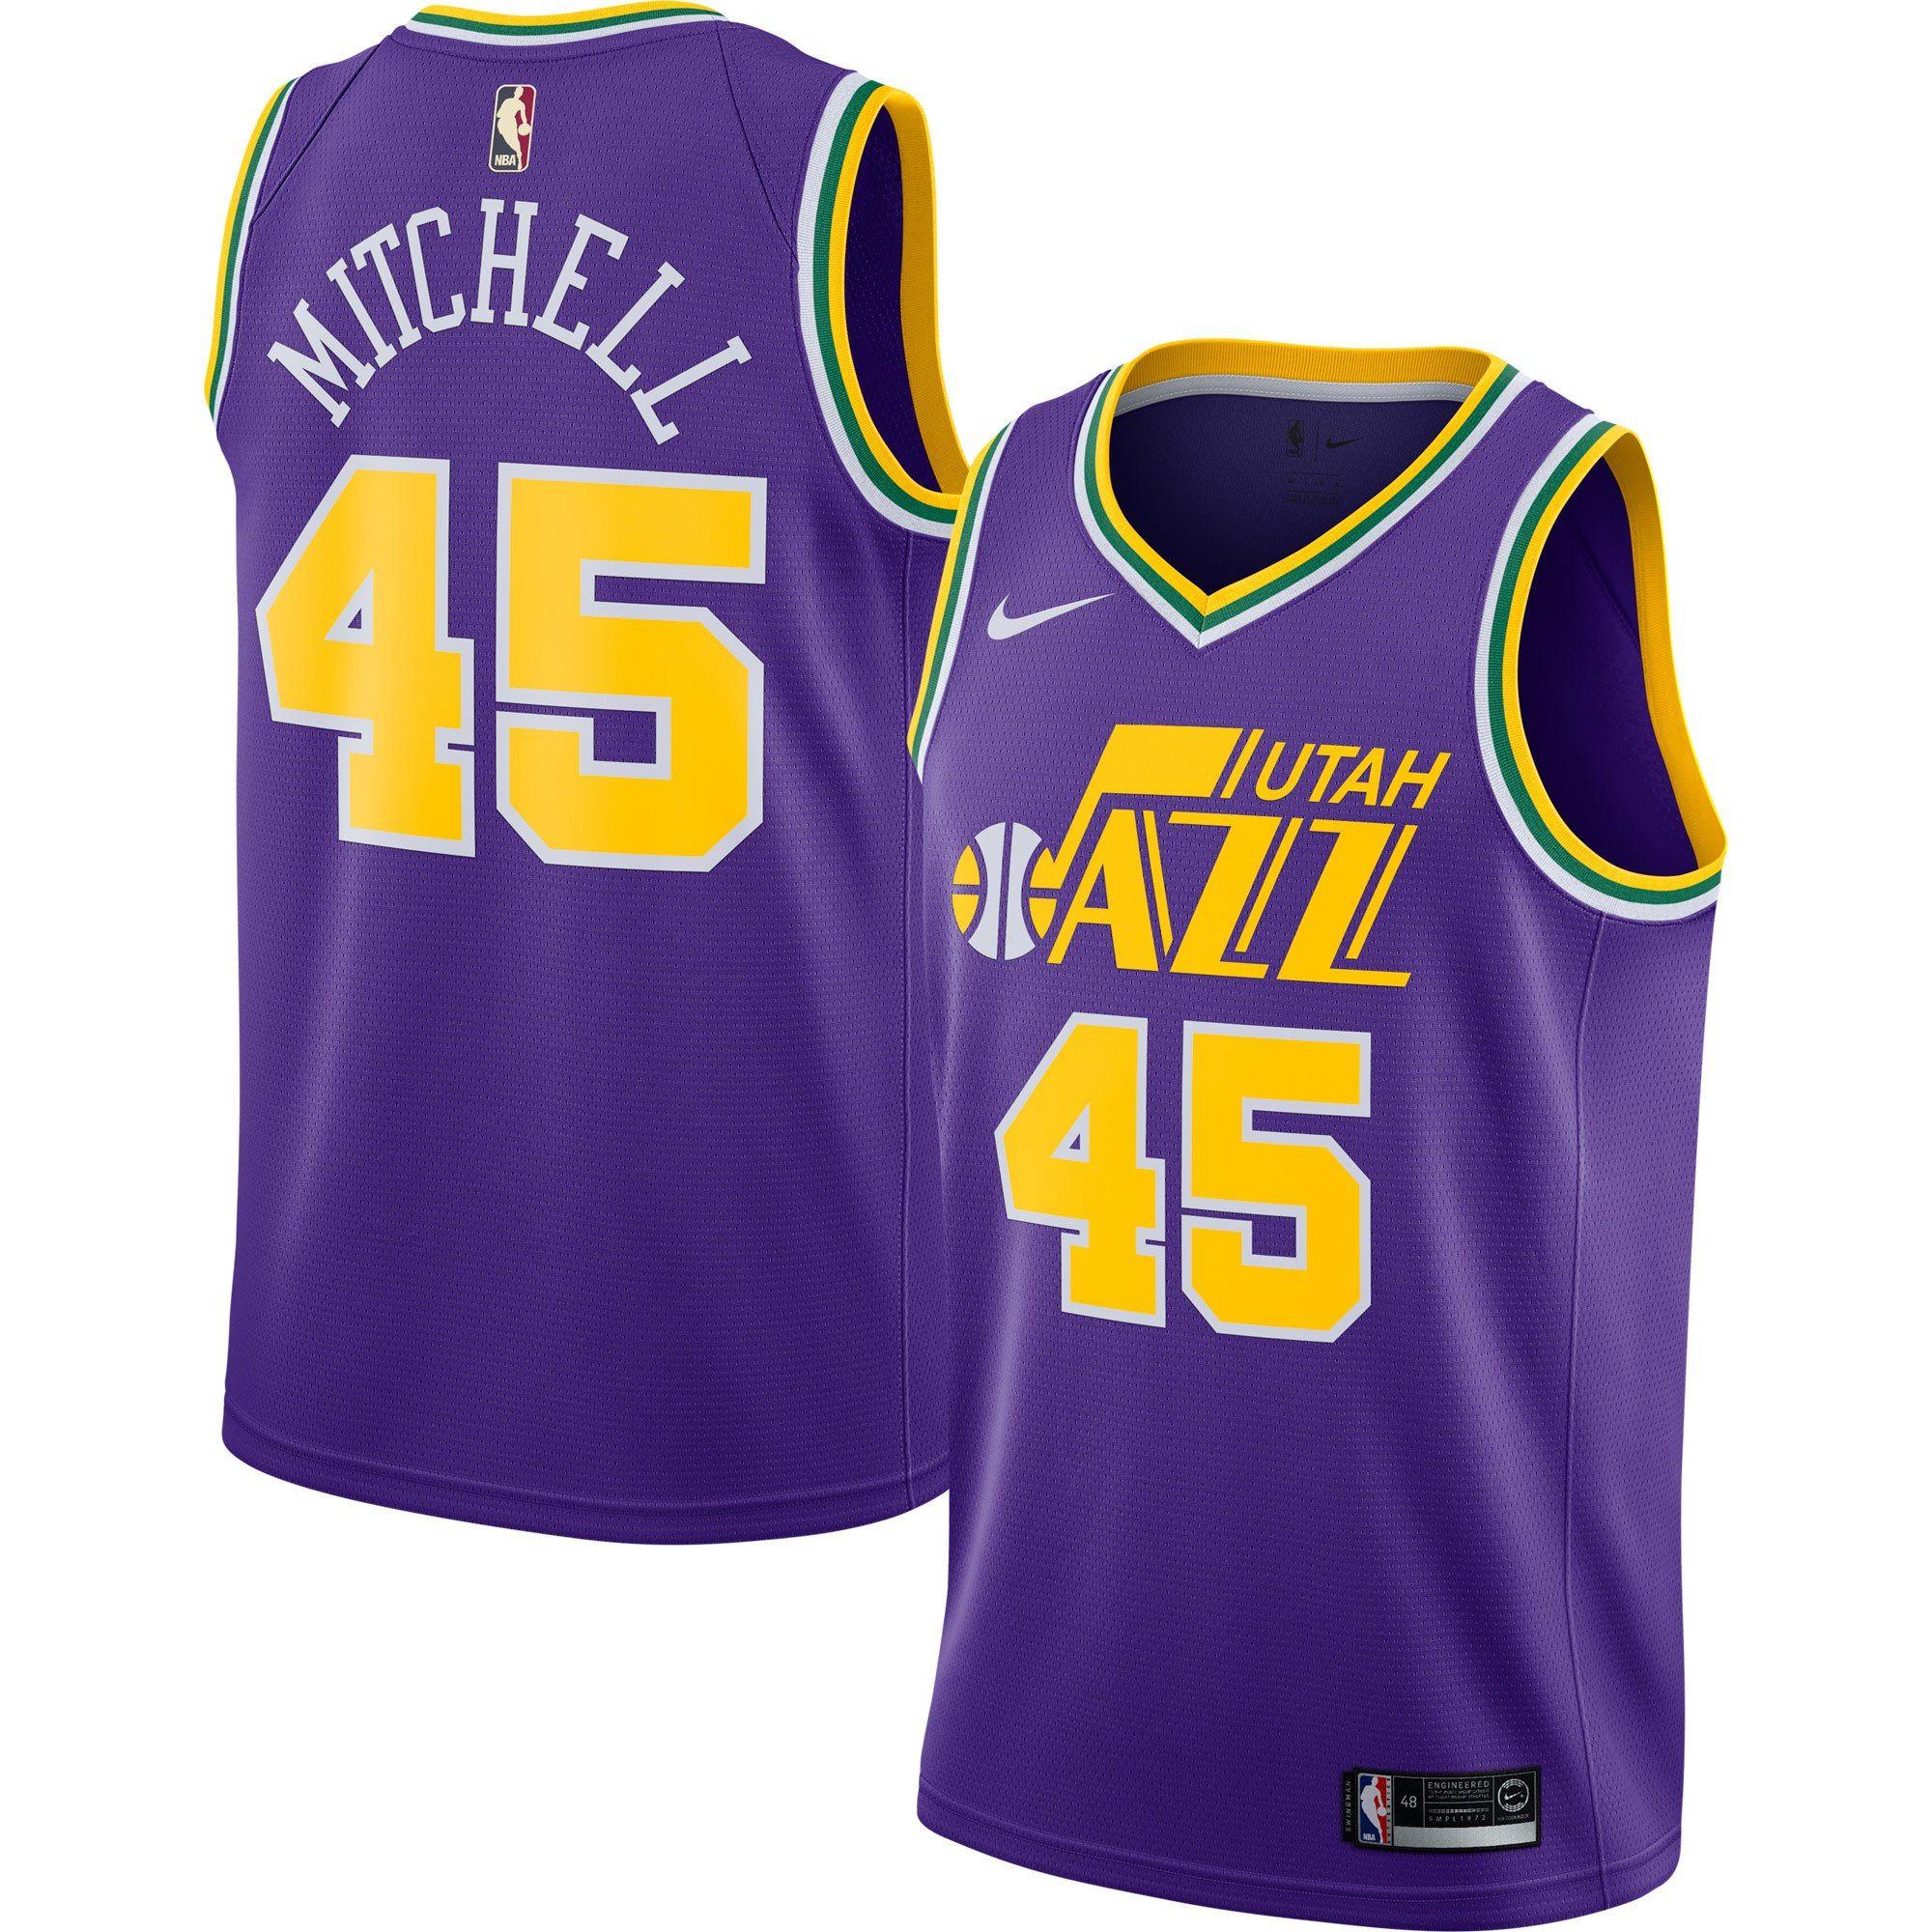 new arrival 7162c f0f45 Men's Utah Jazz Donovan Mitchell Nike Purple Hardwood ...